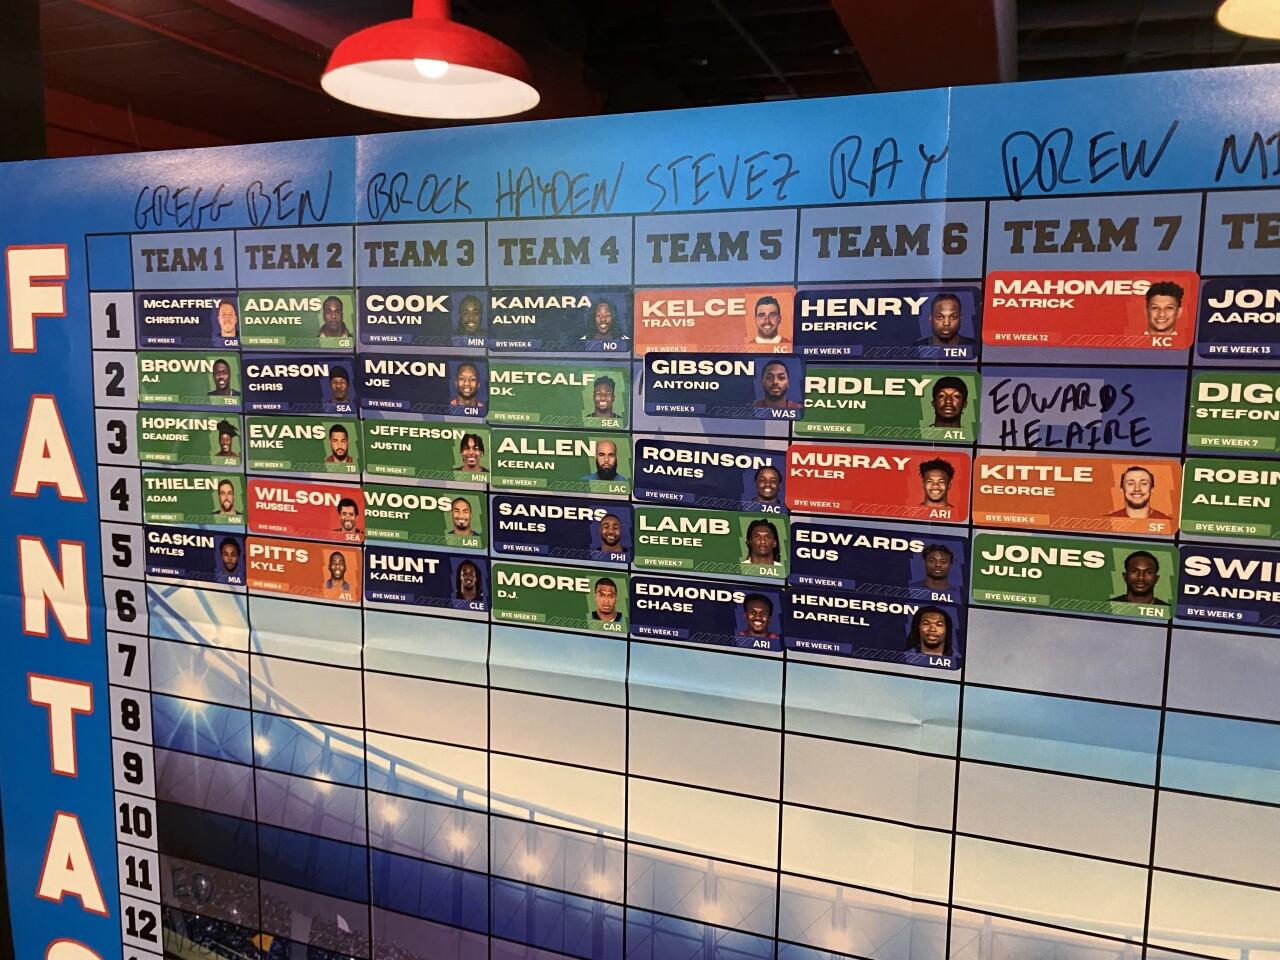 'Brock and Bros' fantasy football league draft board